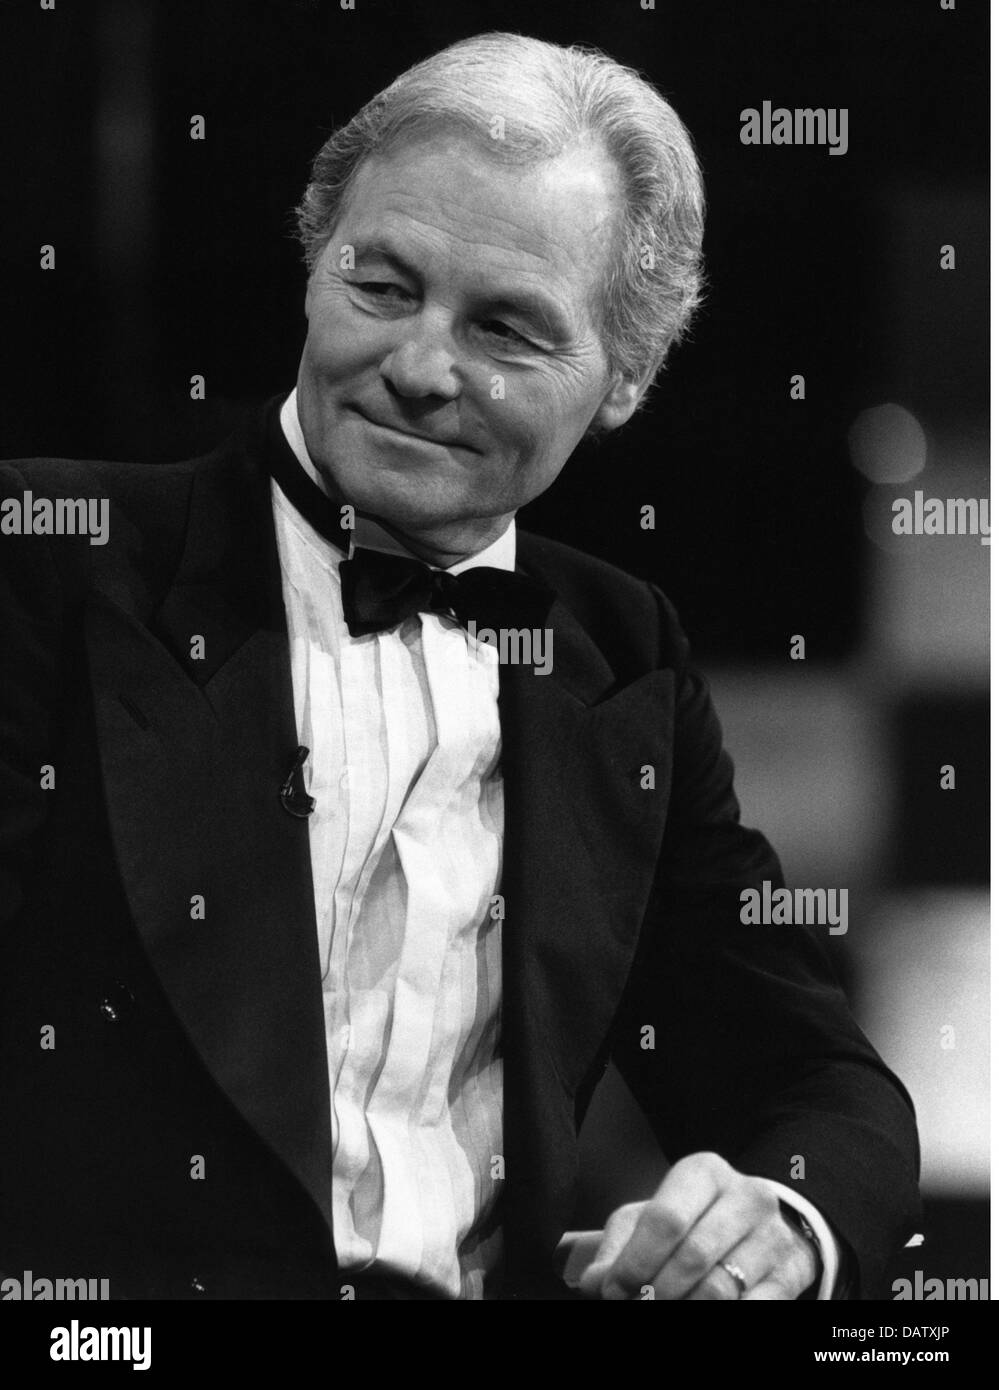 Valerien, Harry, 4.11.1923 - 12.10.2012, German television presenter, half length for the telecast 'Live', - Stock Image